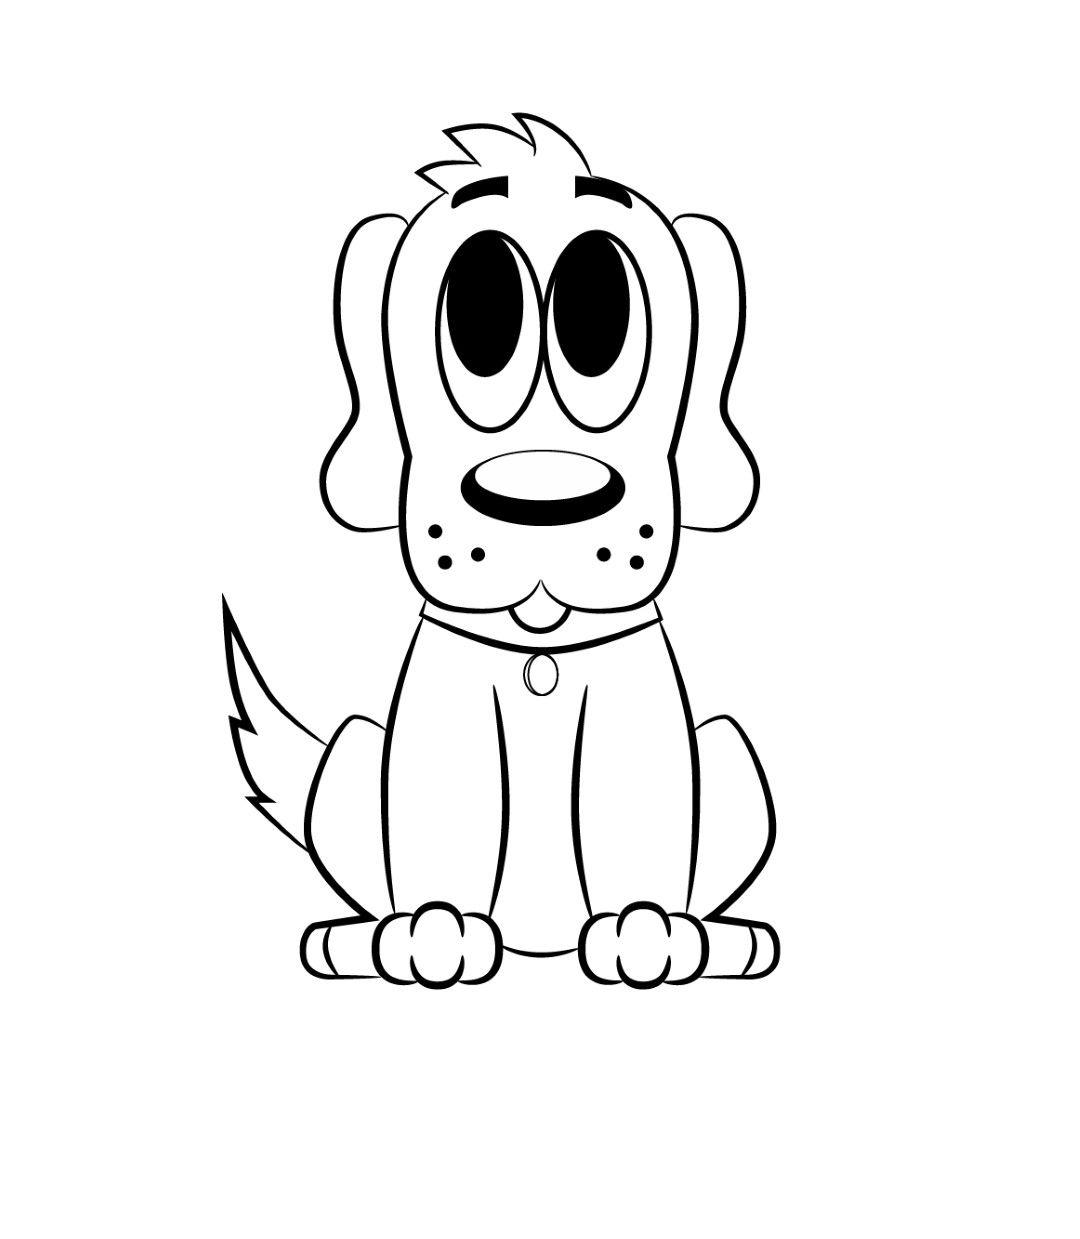 1080x1239 how to draw a cartoon dog cartoon dog cartoon dog drawing